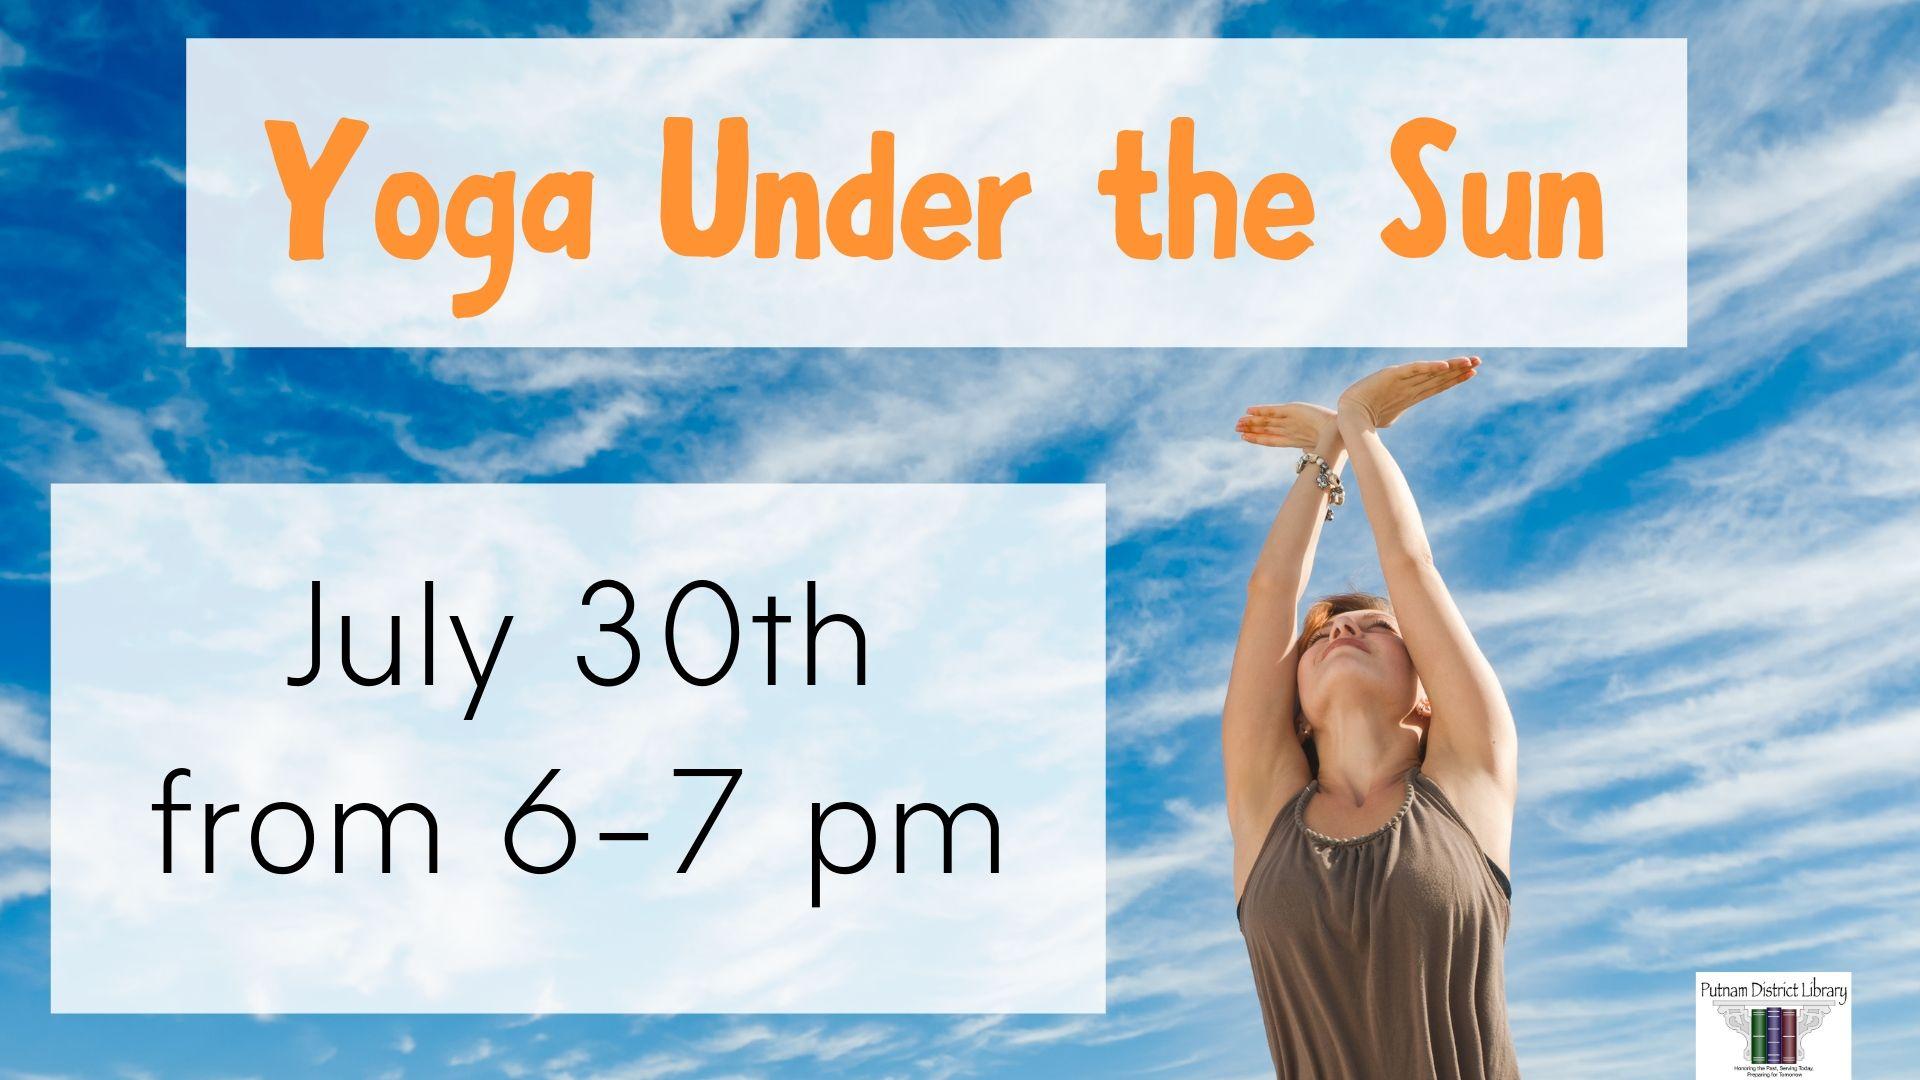 Yoga Under the Sun